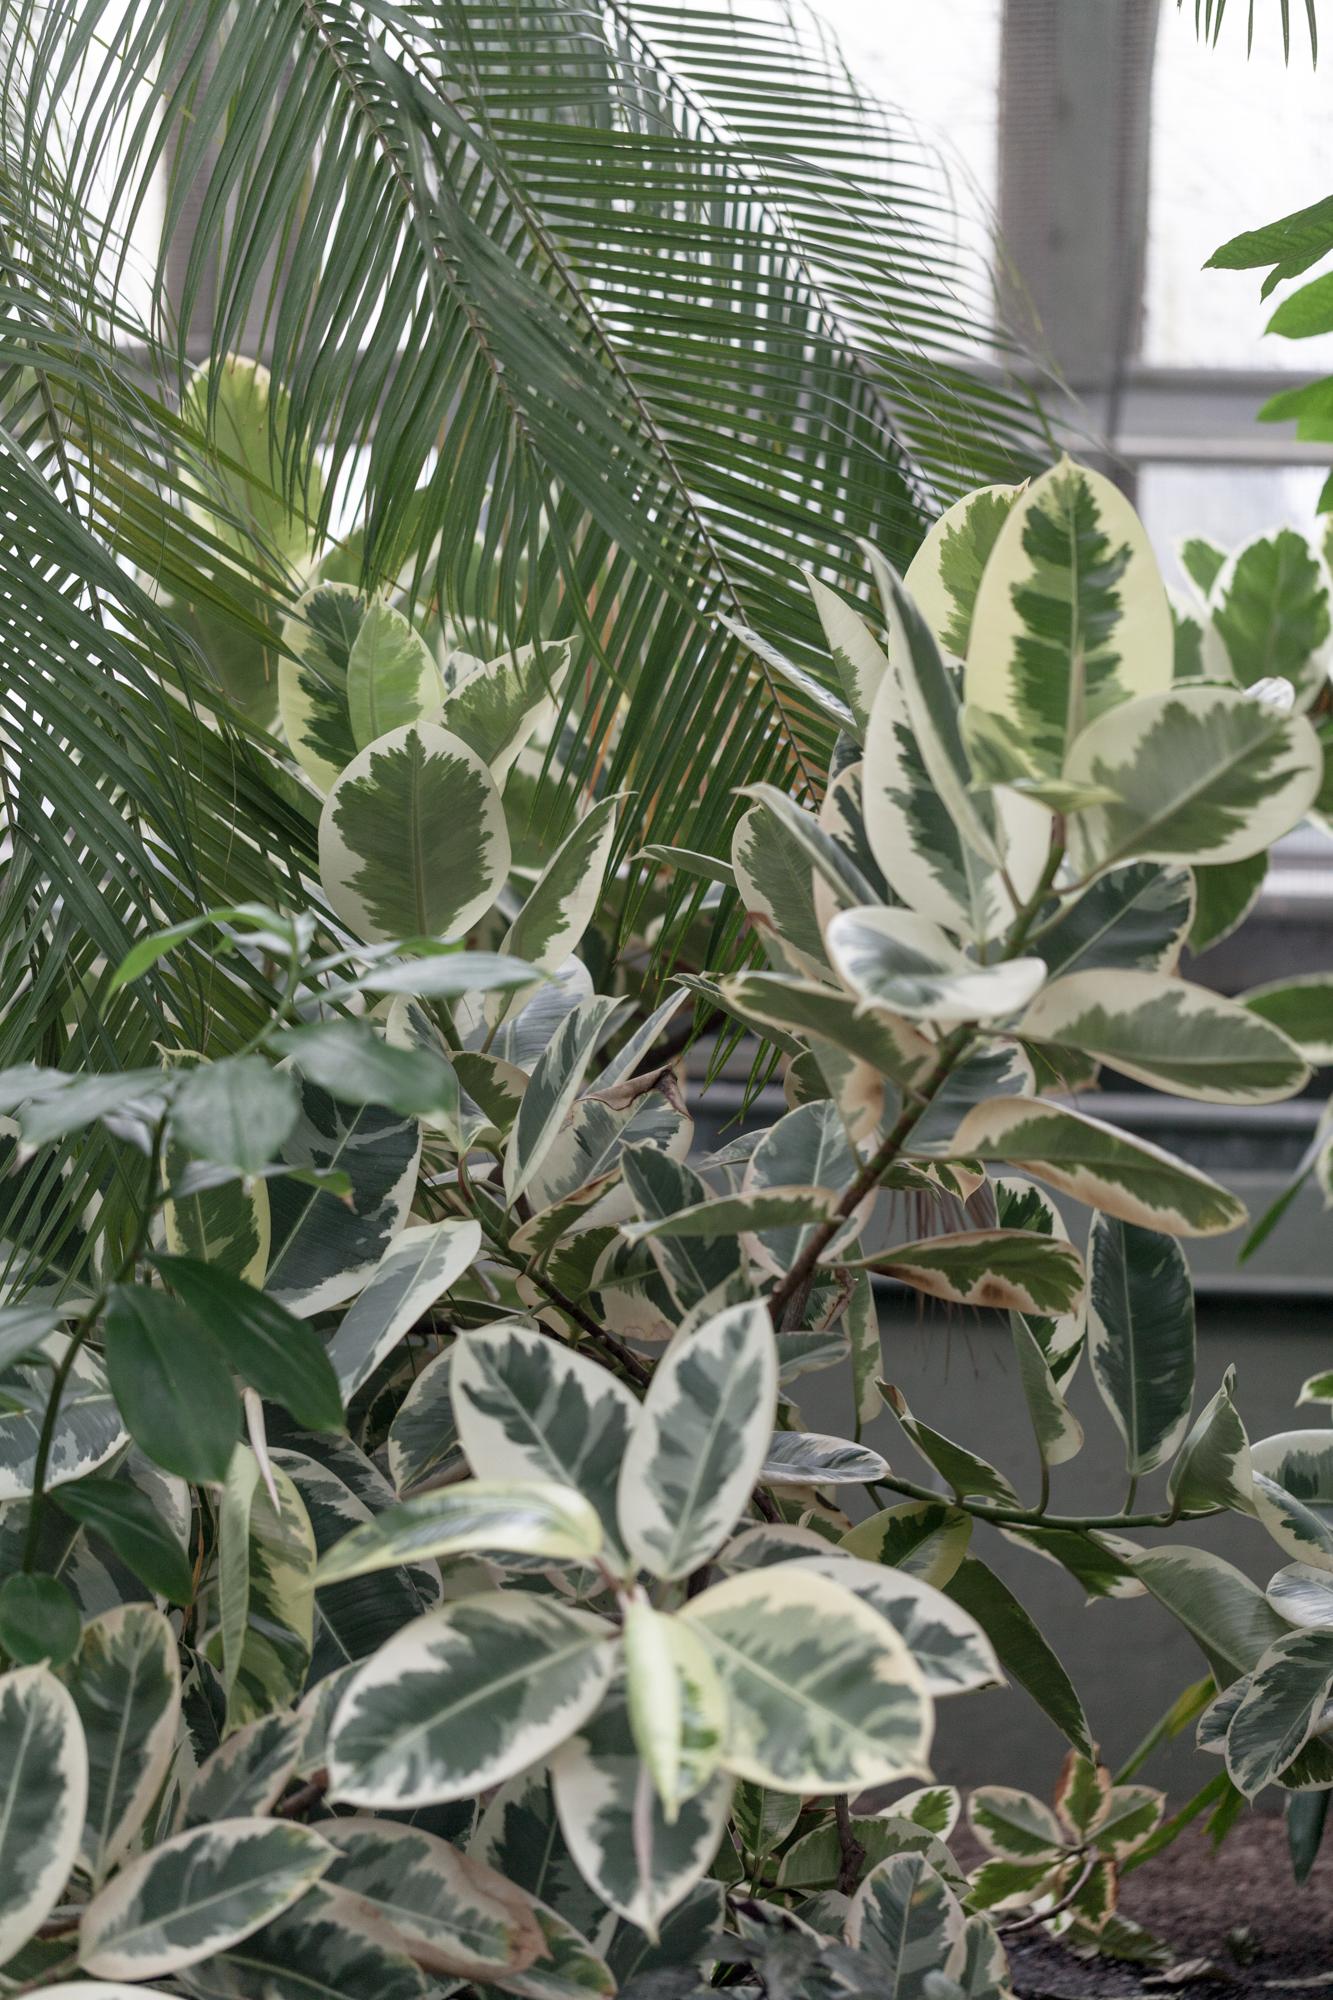 A  Ficus elastica variegata  at the Garfield Park Conservatory.